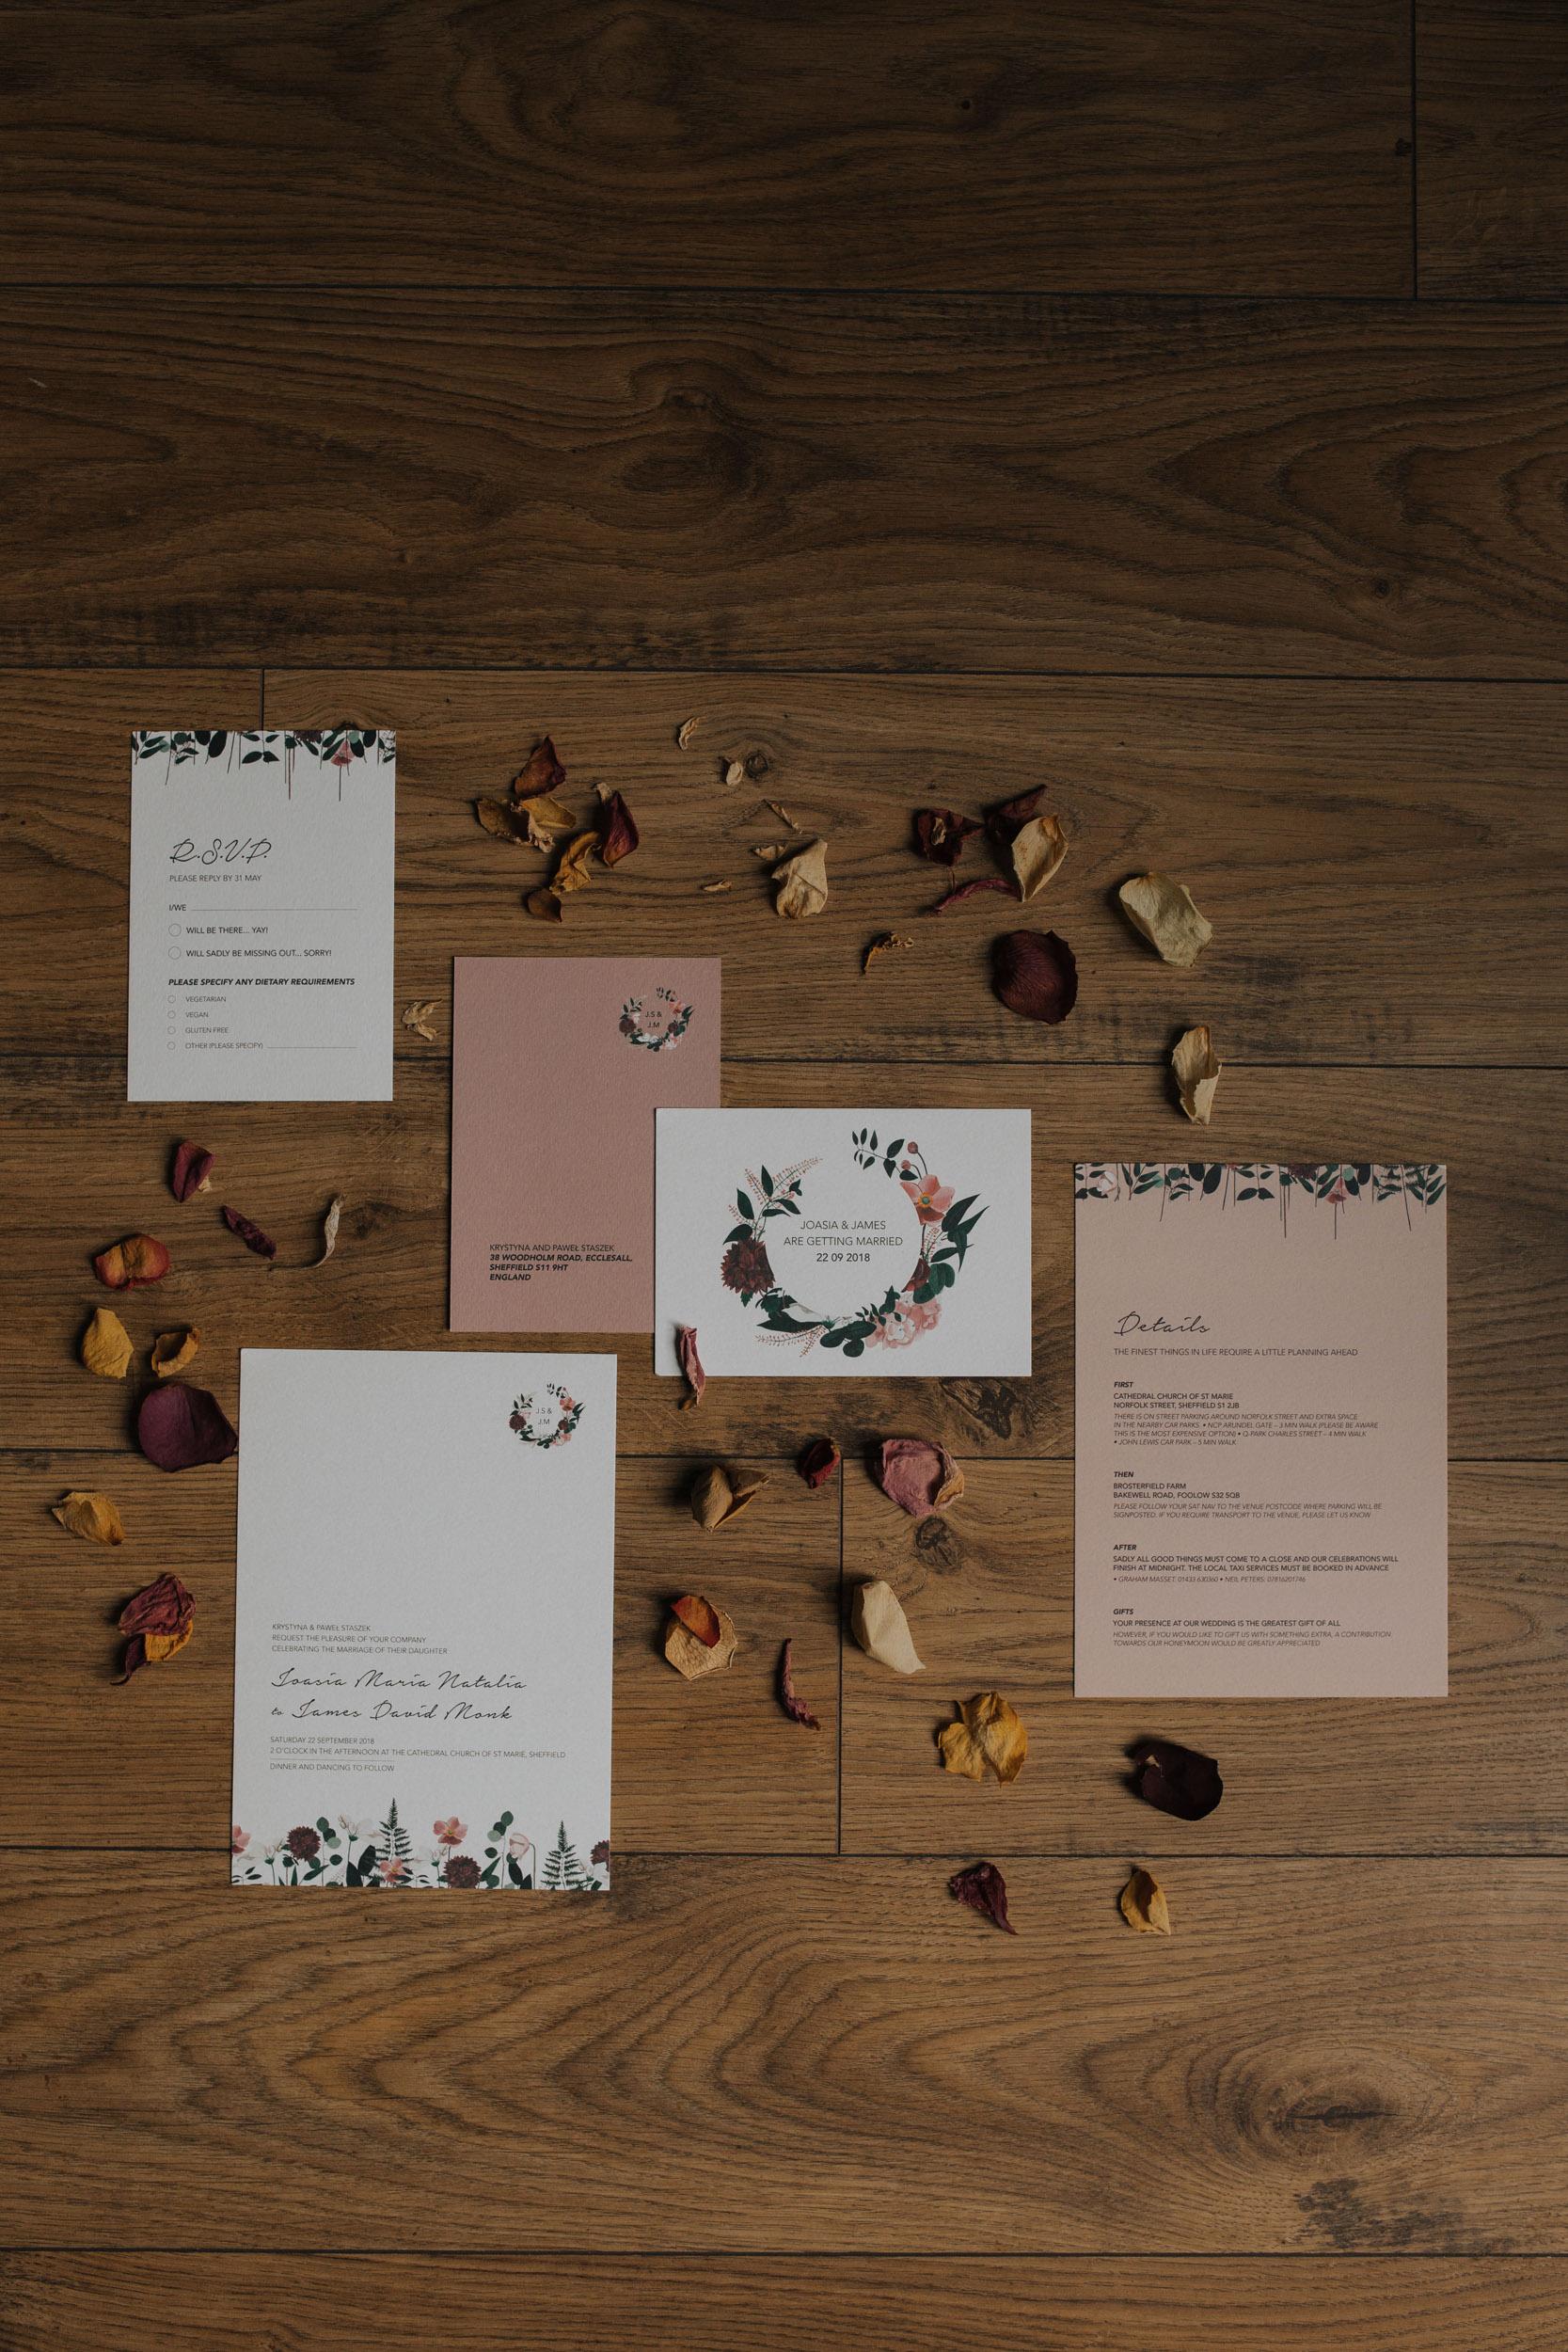 Joasia-Kate-Beaumont-Bohemian-Lace-Wedding-Dress-Peak-District-Sheffield-Wedding-4.jpg